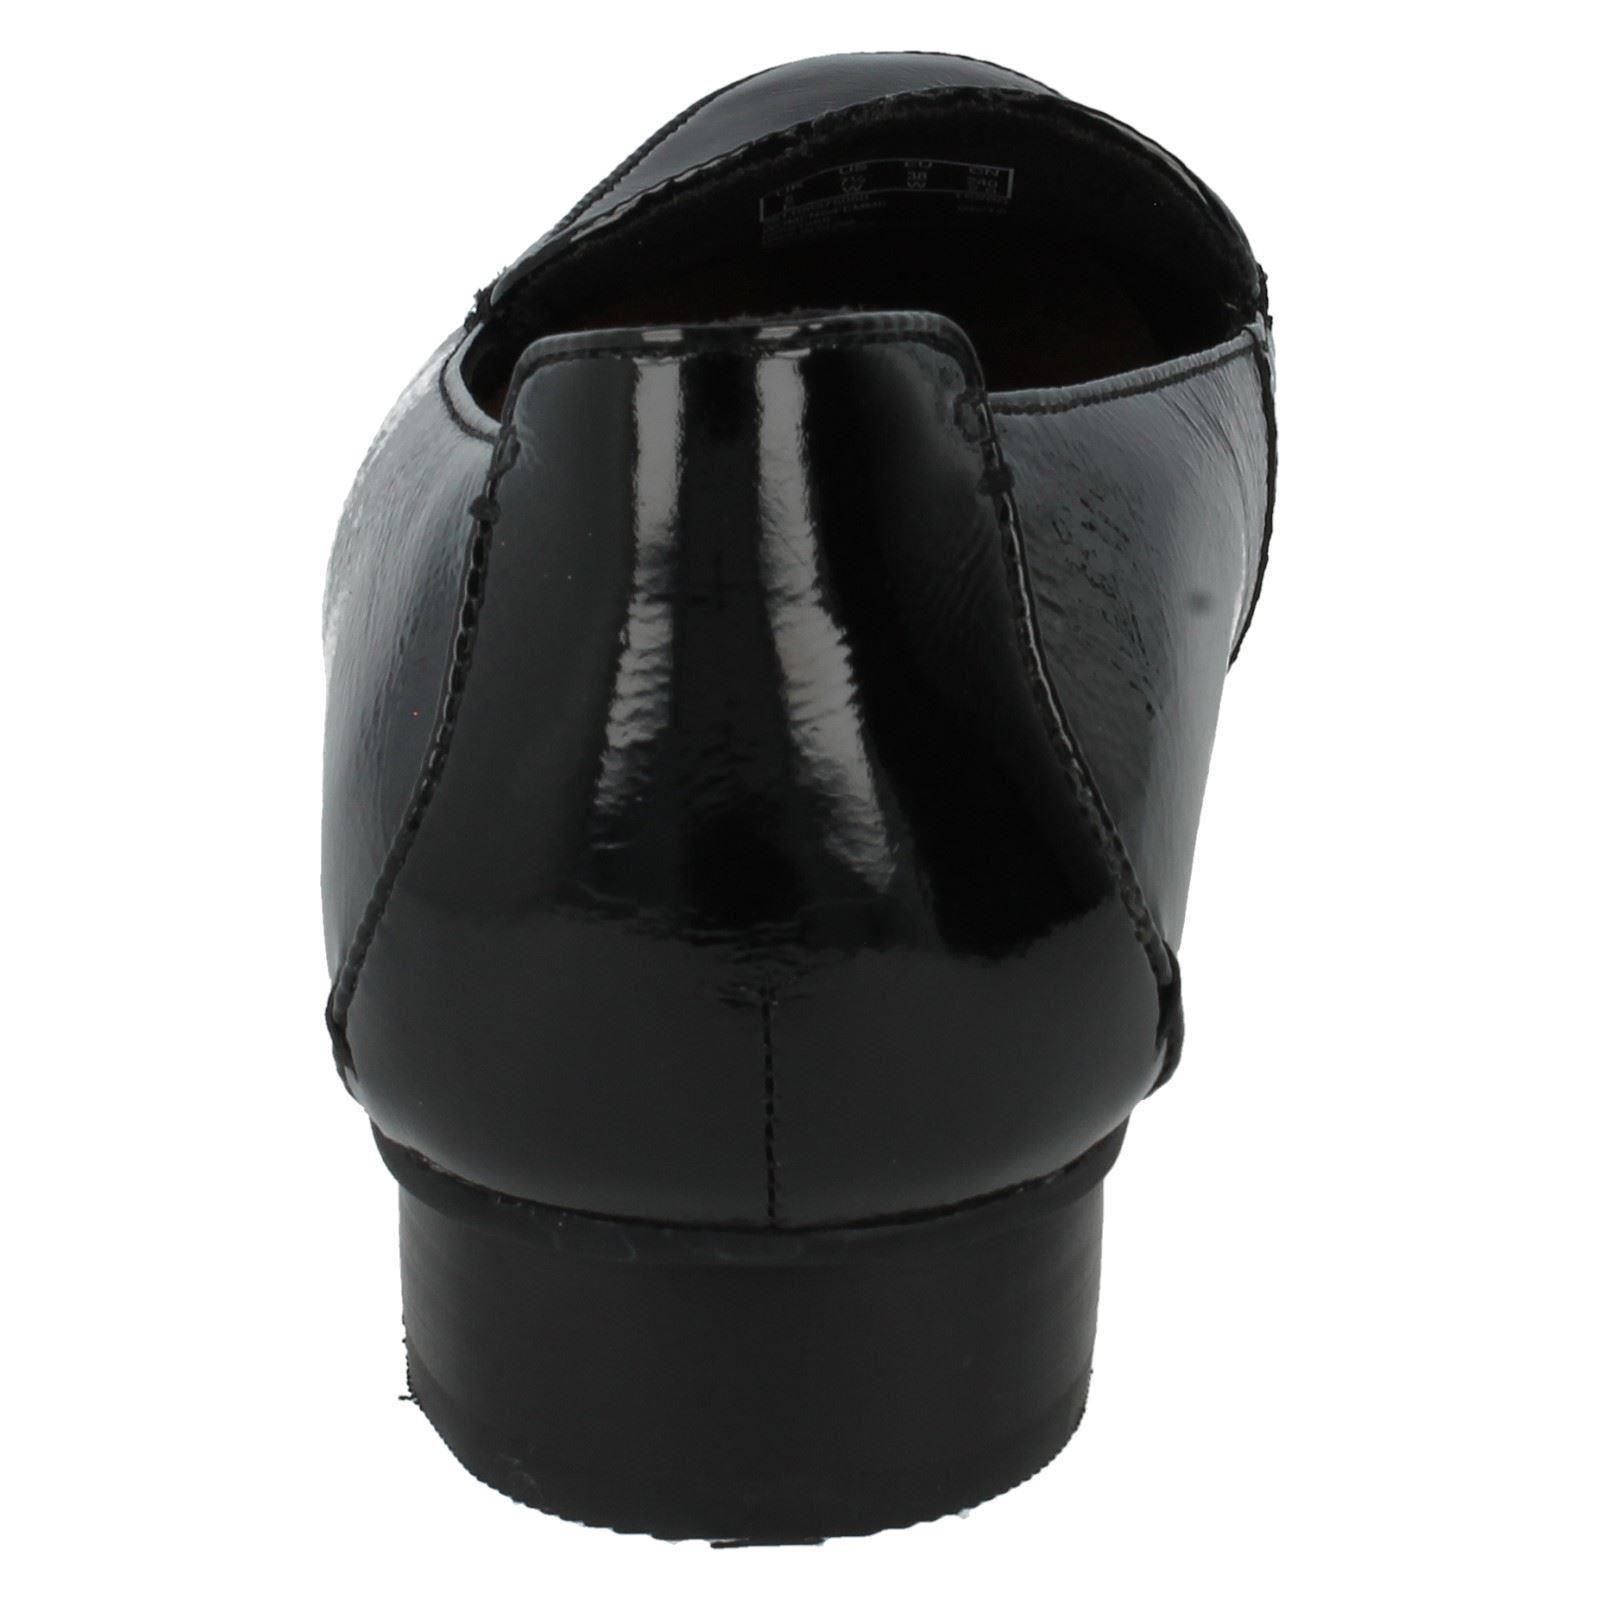 Clarks Cordones Zapato Sin Cordones Clarks Mujer - keesha LUCA 86b7cc